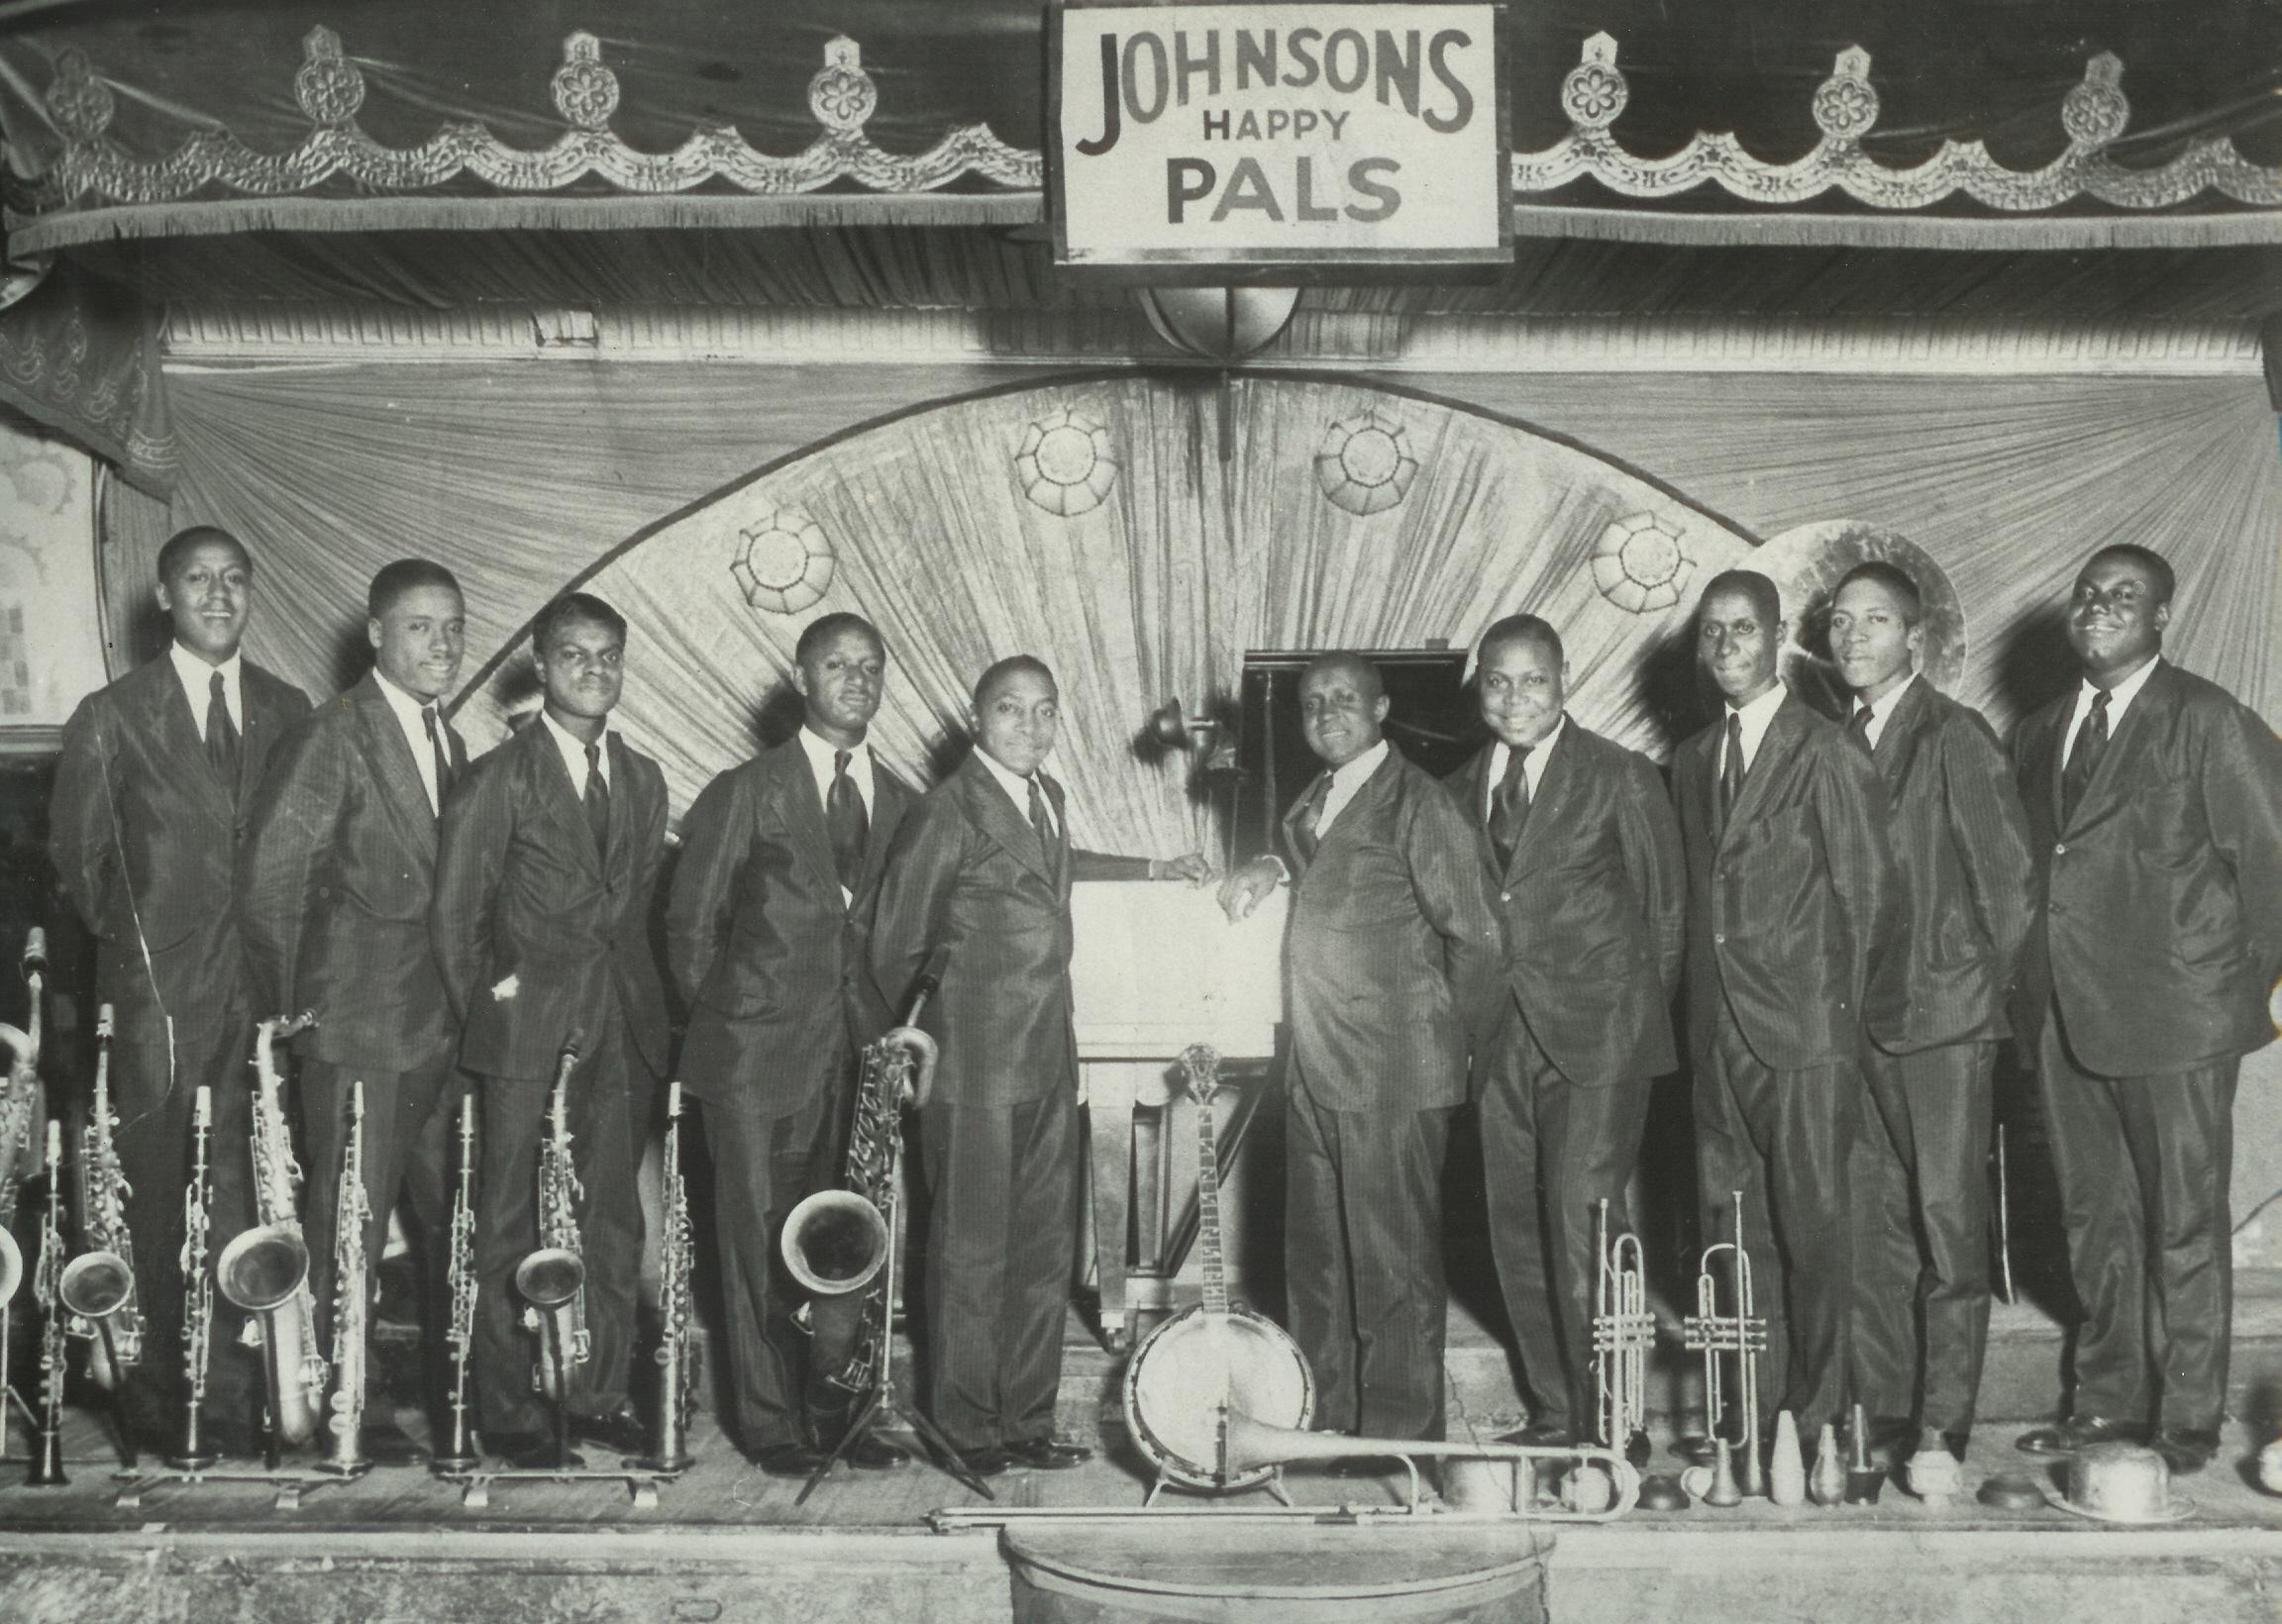 1929 – Johnsons Happy Pals. Source: Richmond Jazz Society